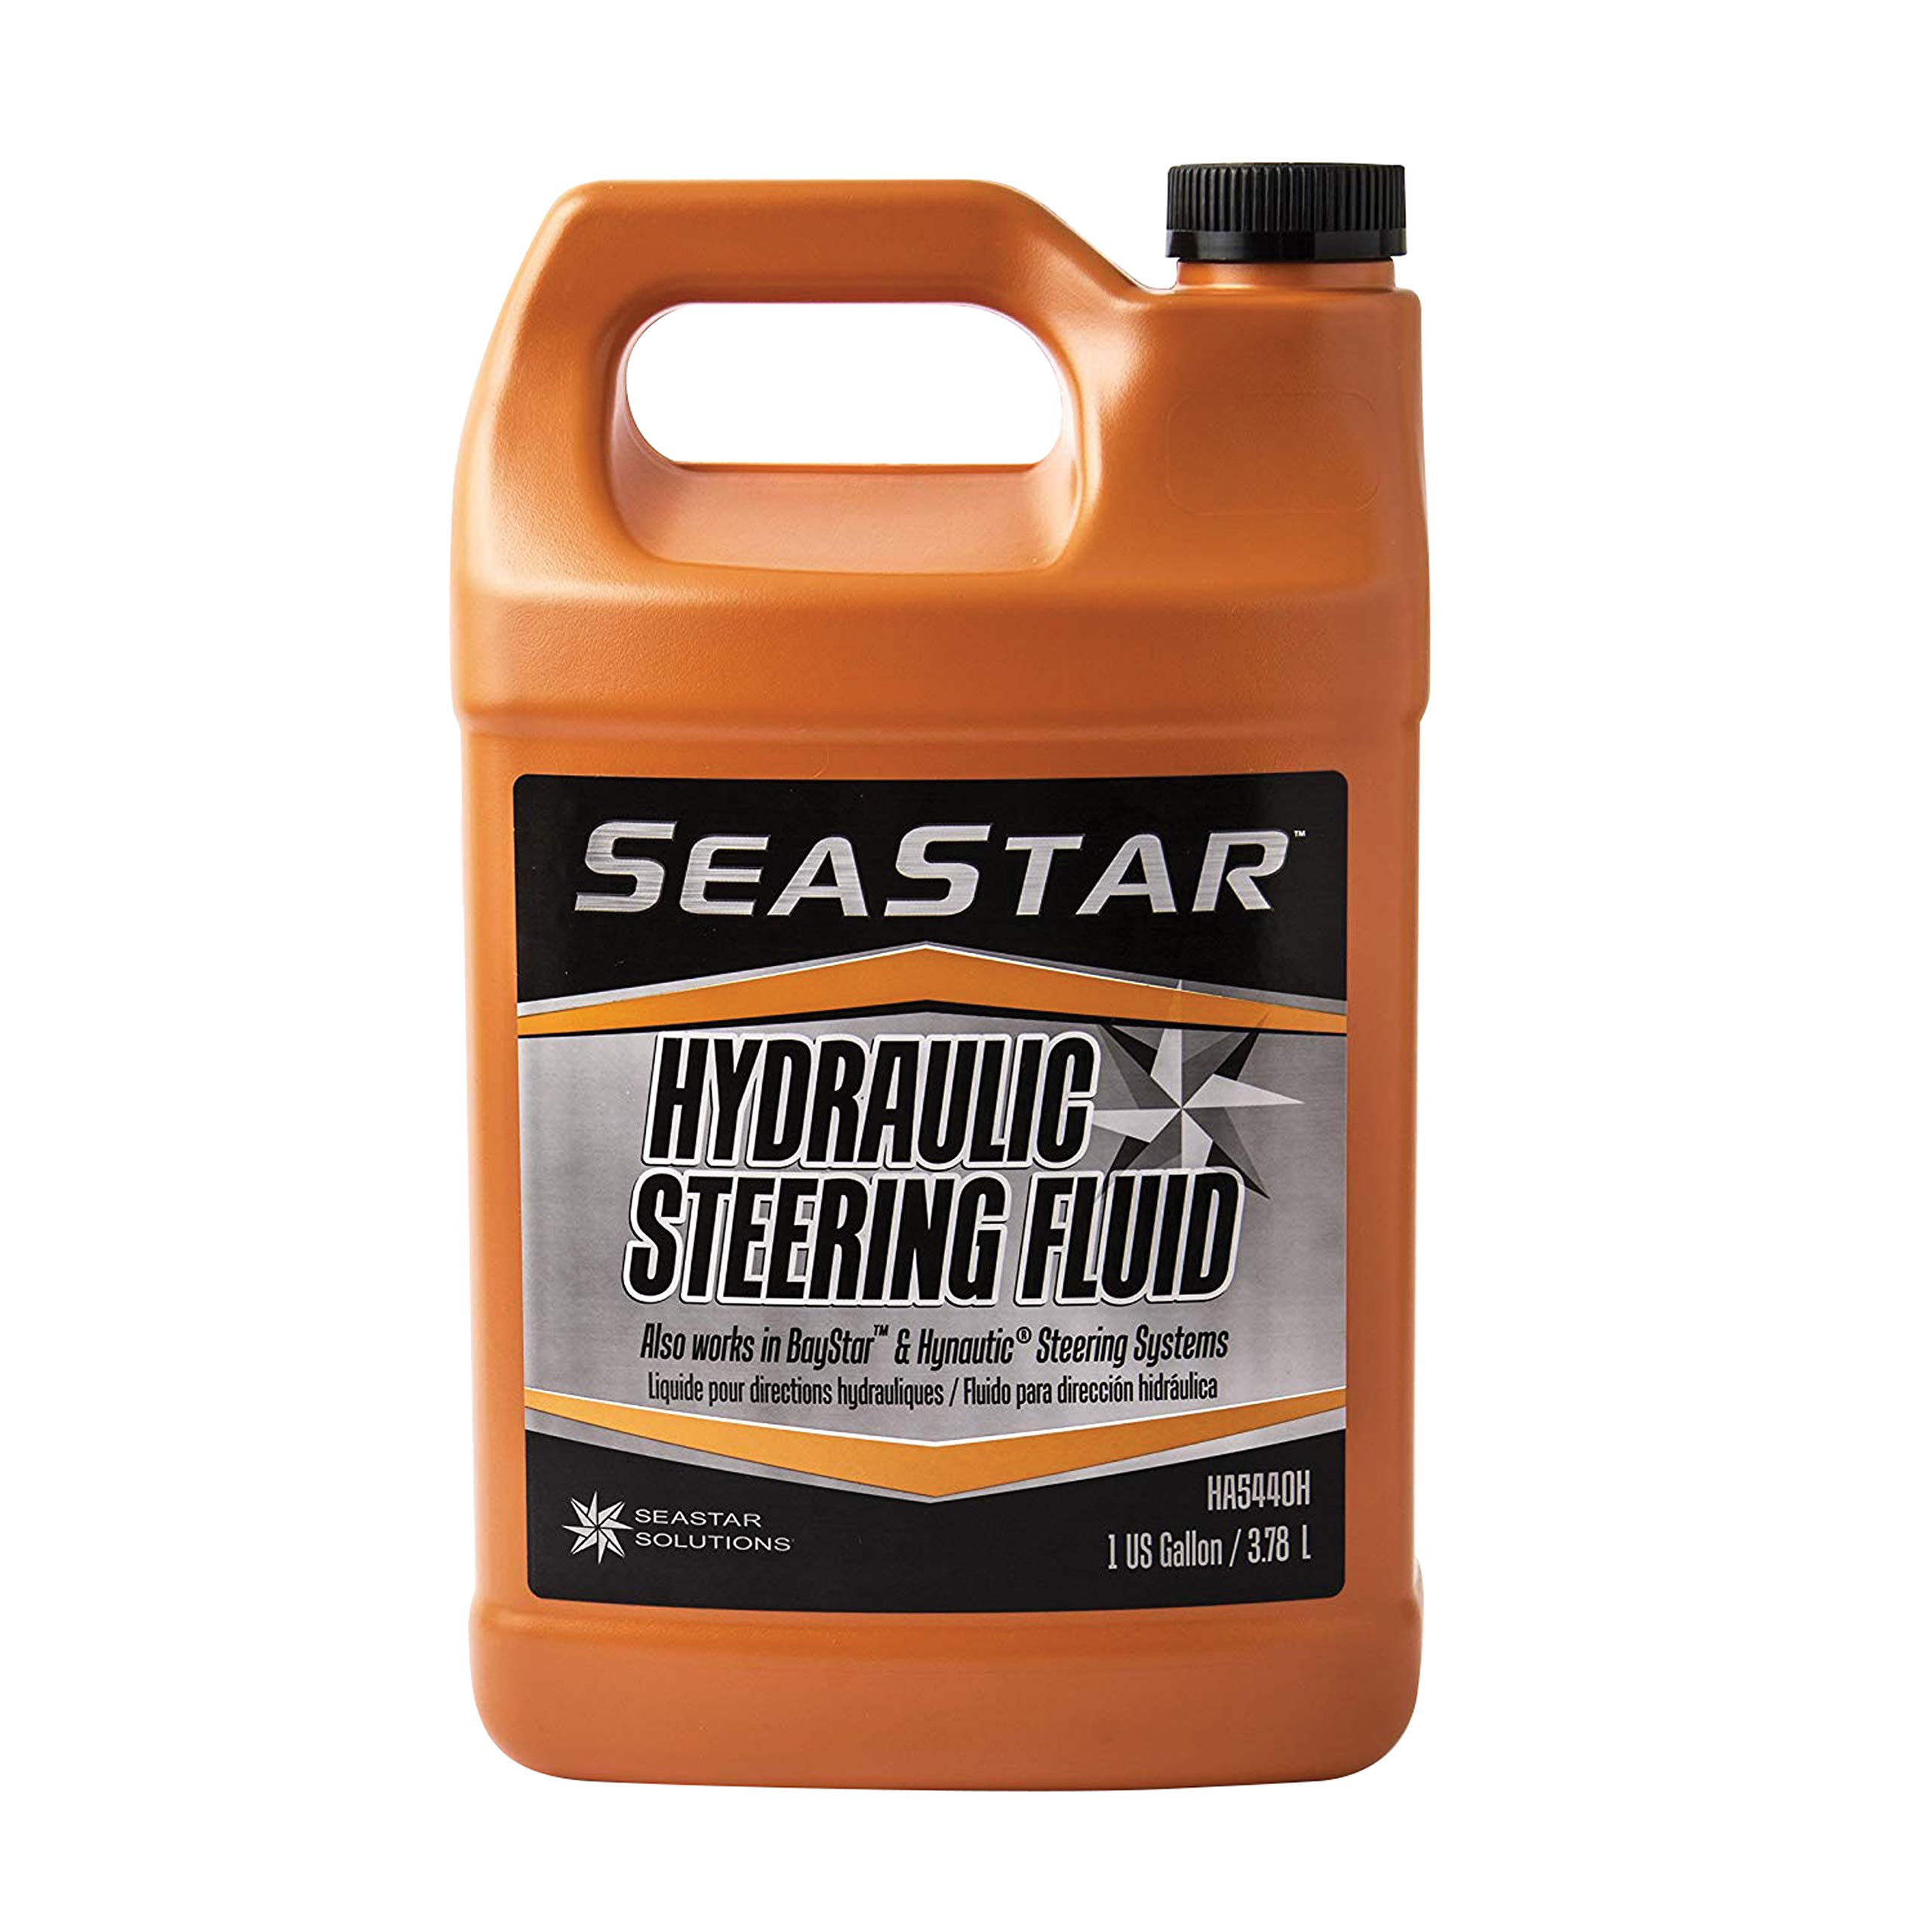 Dometic SeaStar Hydraulic Steering Fluid, HA5440H, 1 Gallon